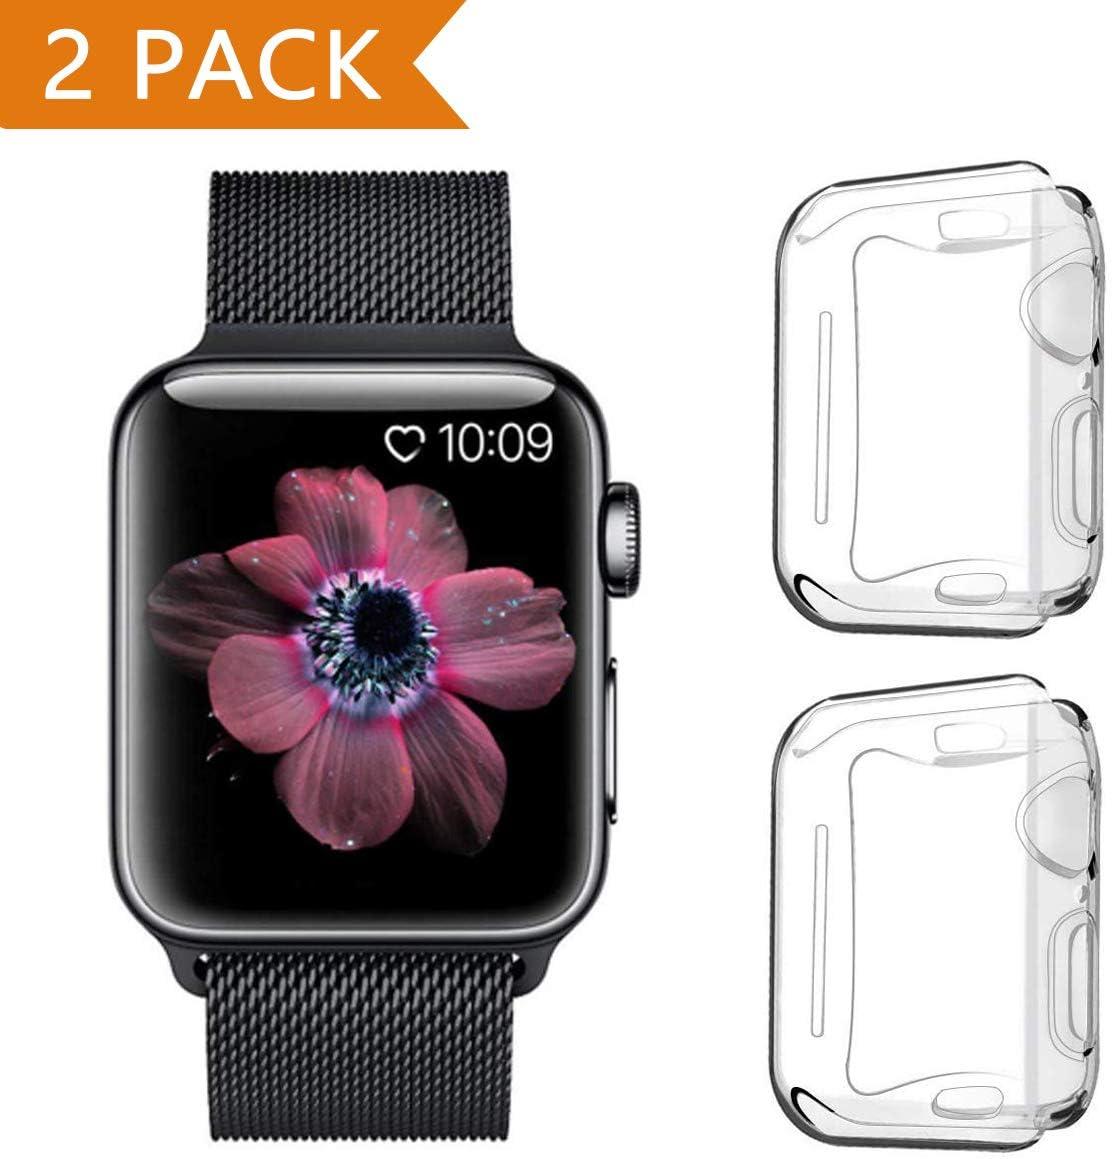 PEYOU Funda para Apple Watch 44mm Series 4/Series 5 (2 Unidades), Suave TPU Funda [Cobertura Completa] [Ultra Delgado][HD Claro ][Anti-Arañazos] para Apple Watch Series 4/Series 5 (44mm)